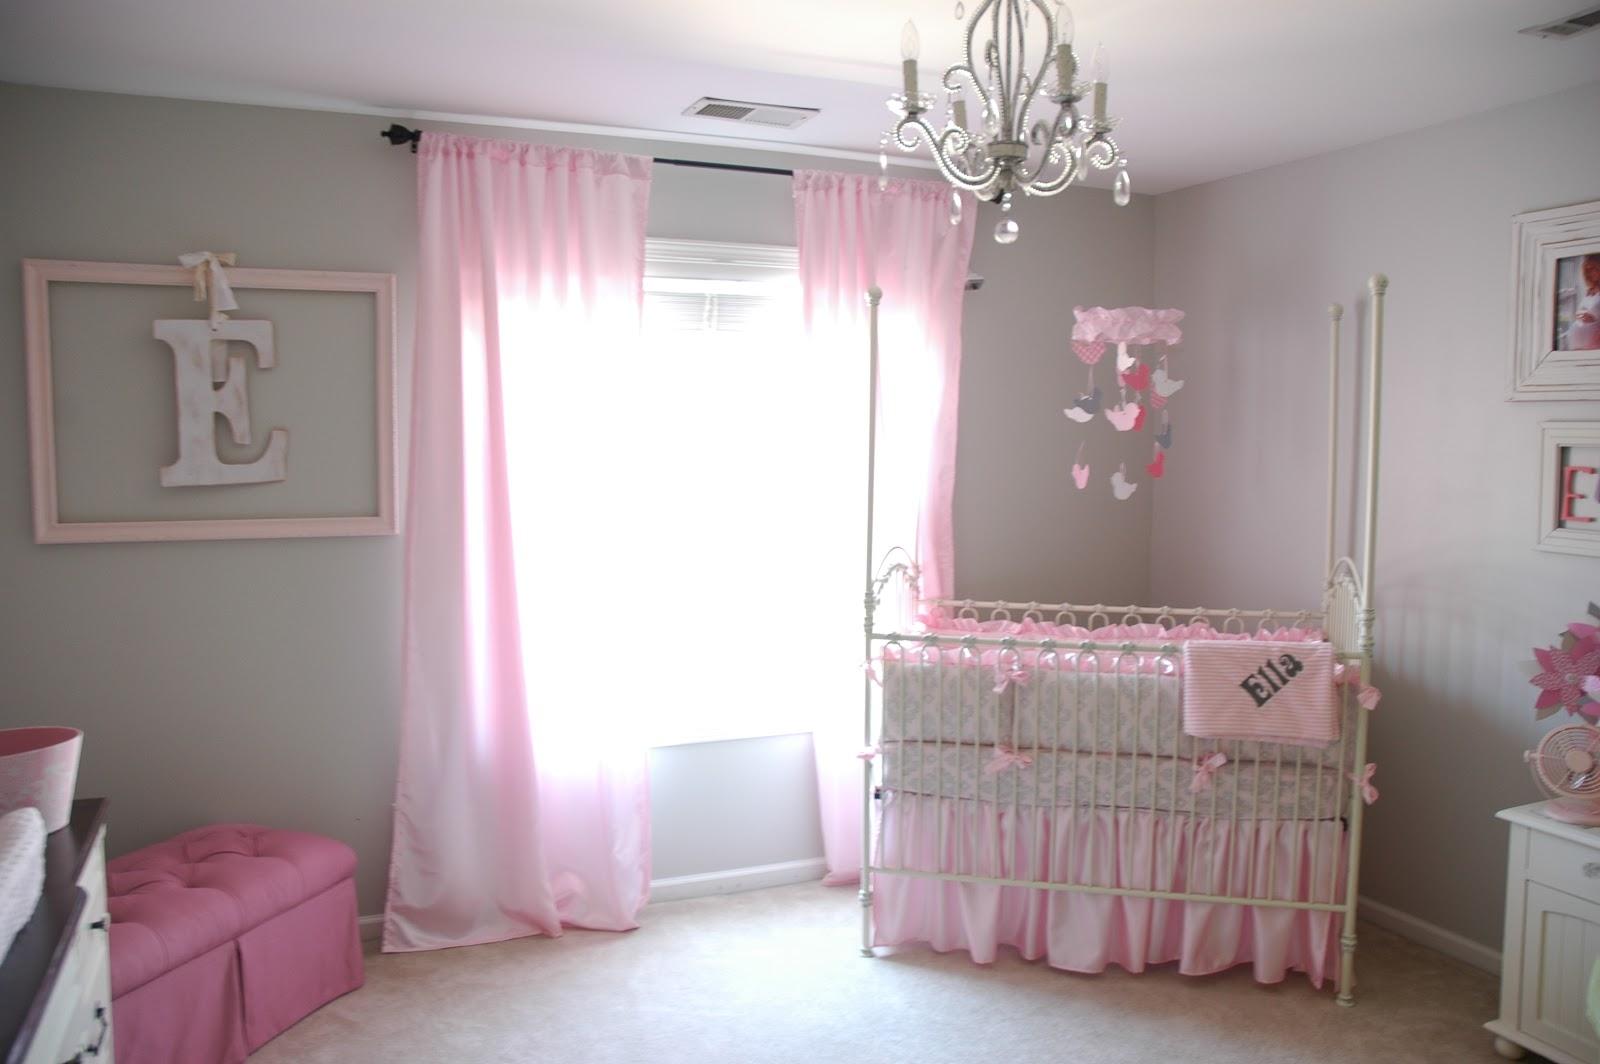 Ba Nursery Decor Pretty Crystal Chandelier Ba Girl Nursery Within Crystal Chandeliers For Baby Girl Room (View 19 of 25)